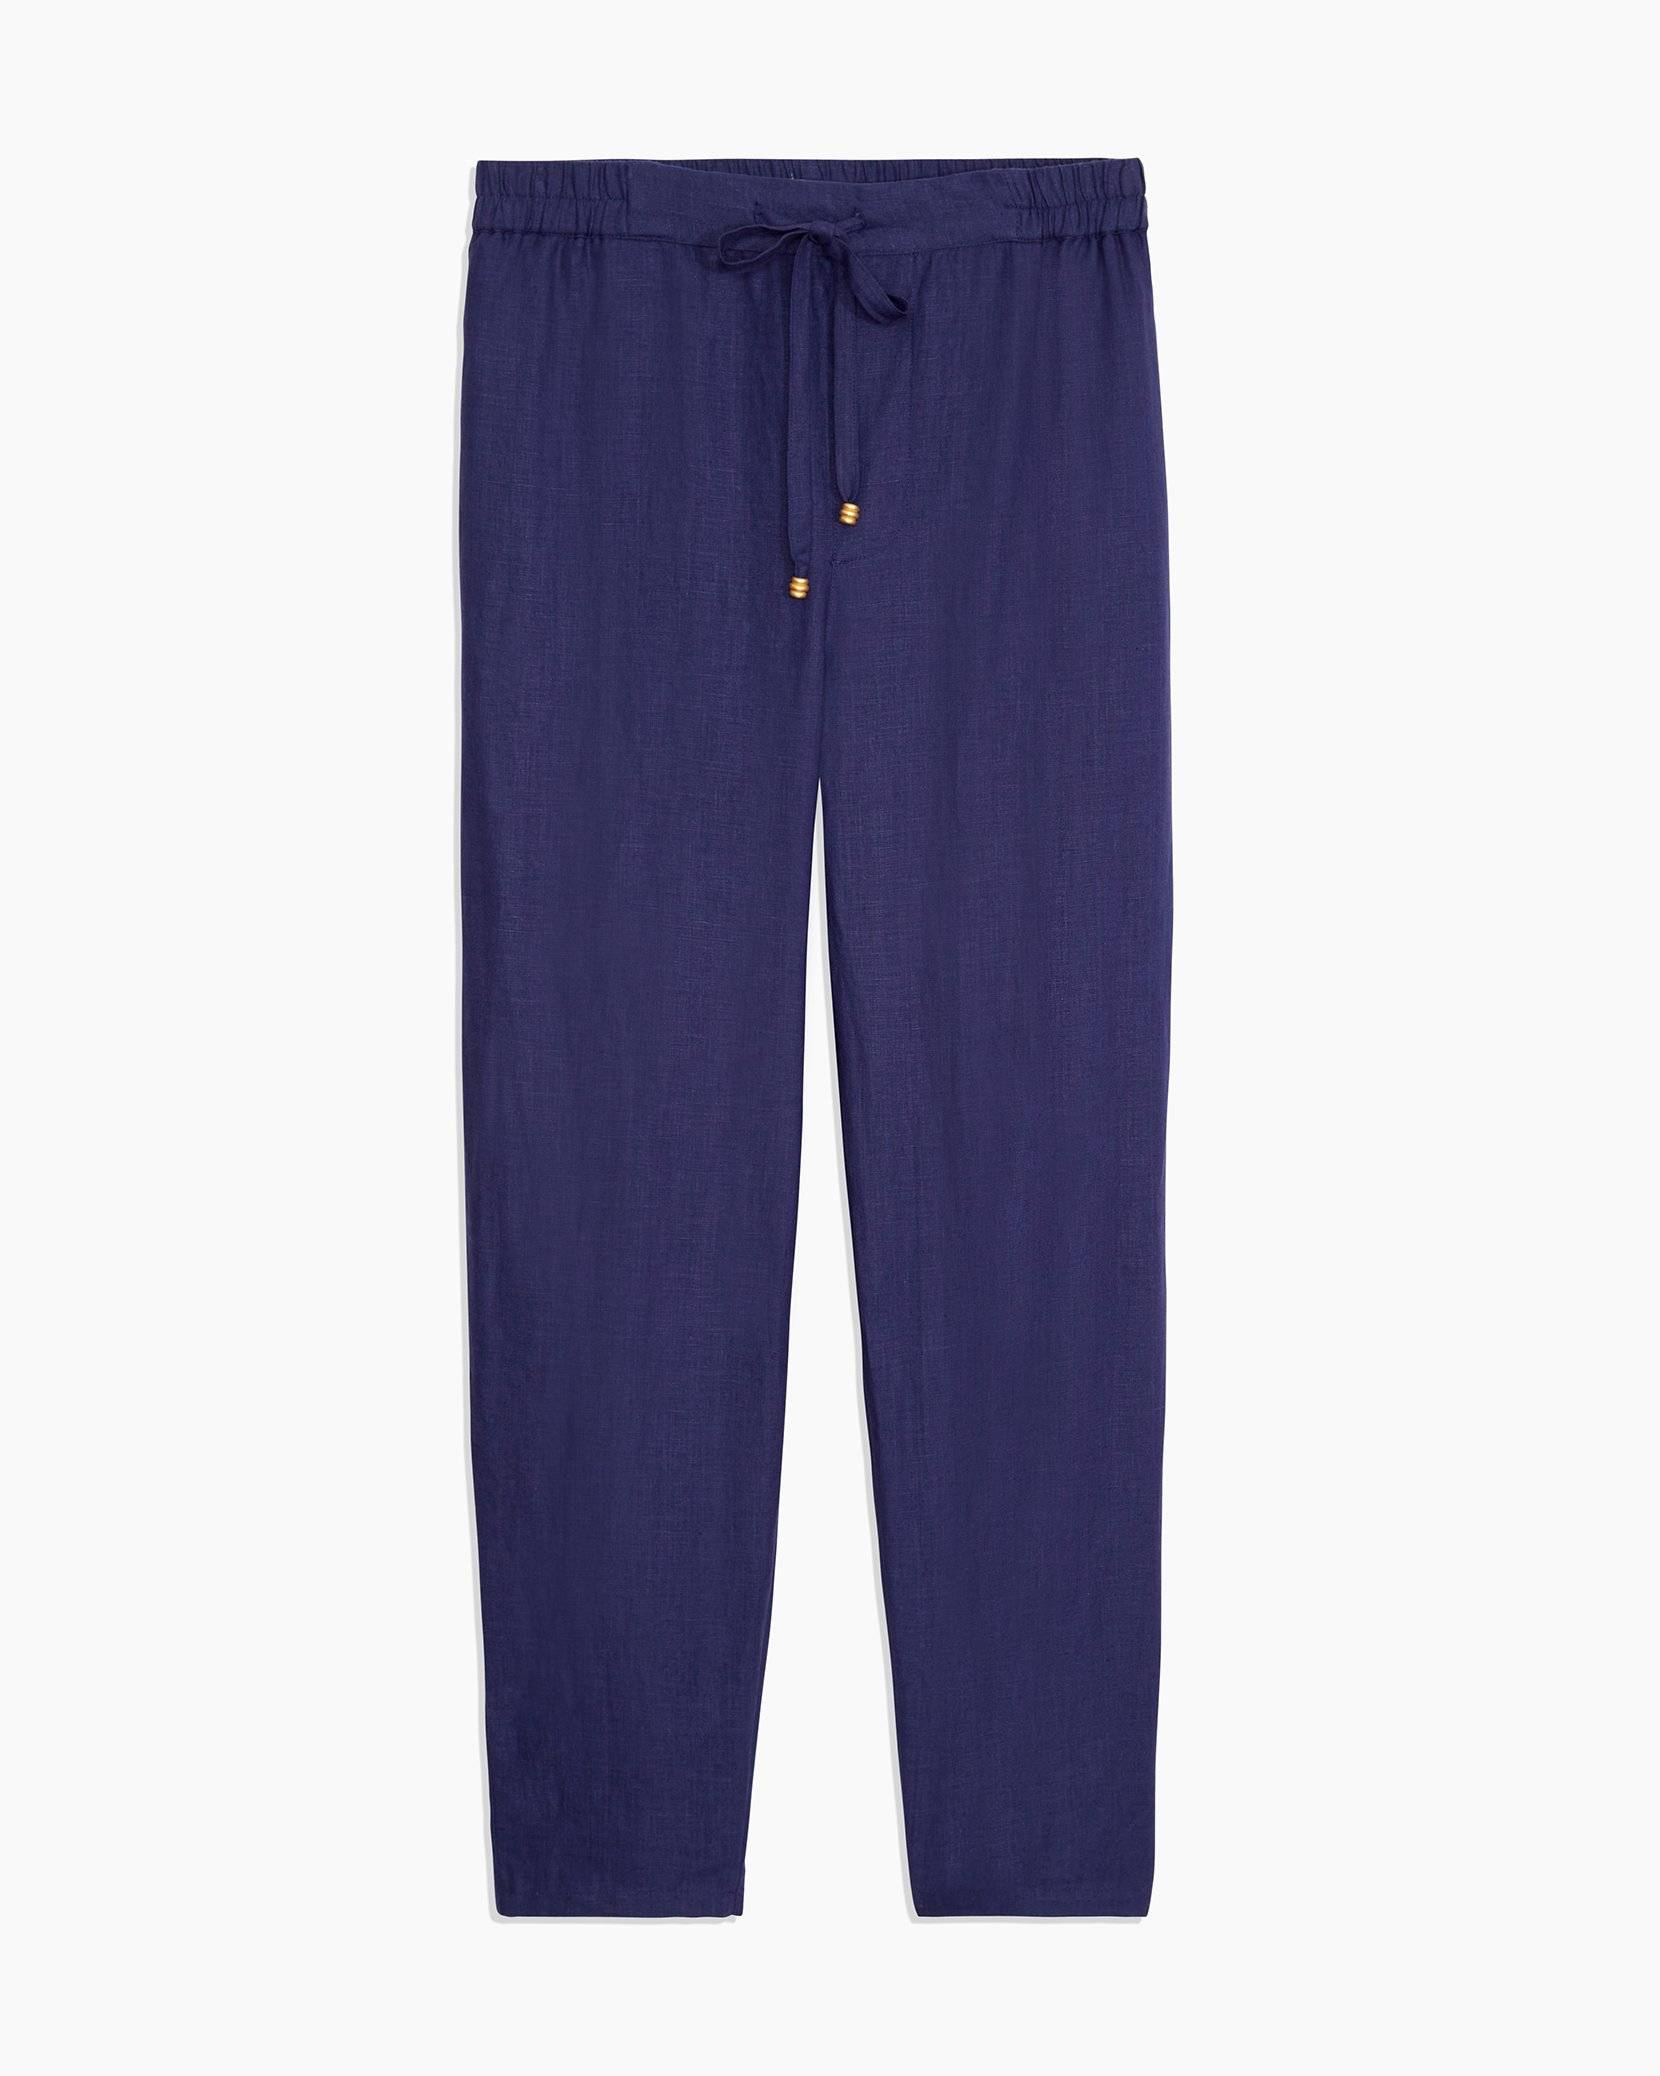 Easy Linen Pant